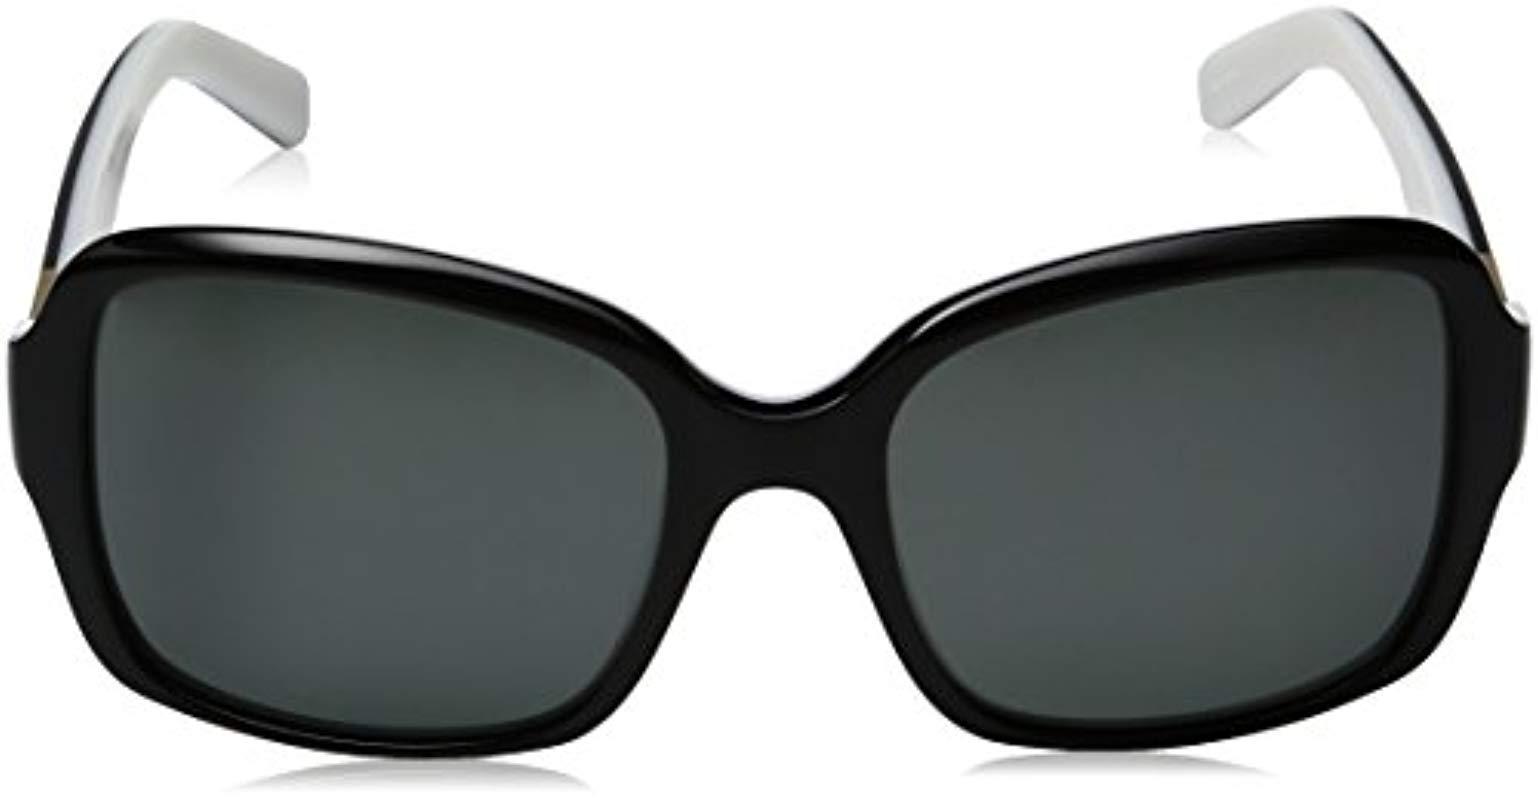 c2d134db164e2 ... Black Kate Spade Annora ps Annorps Polarized Rectangular Sunglasses -  Lyst. View fullscreen